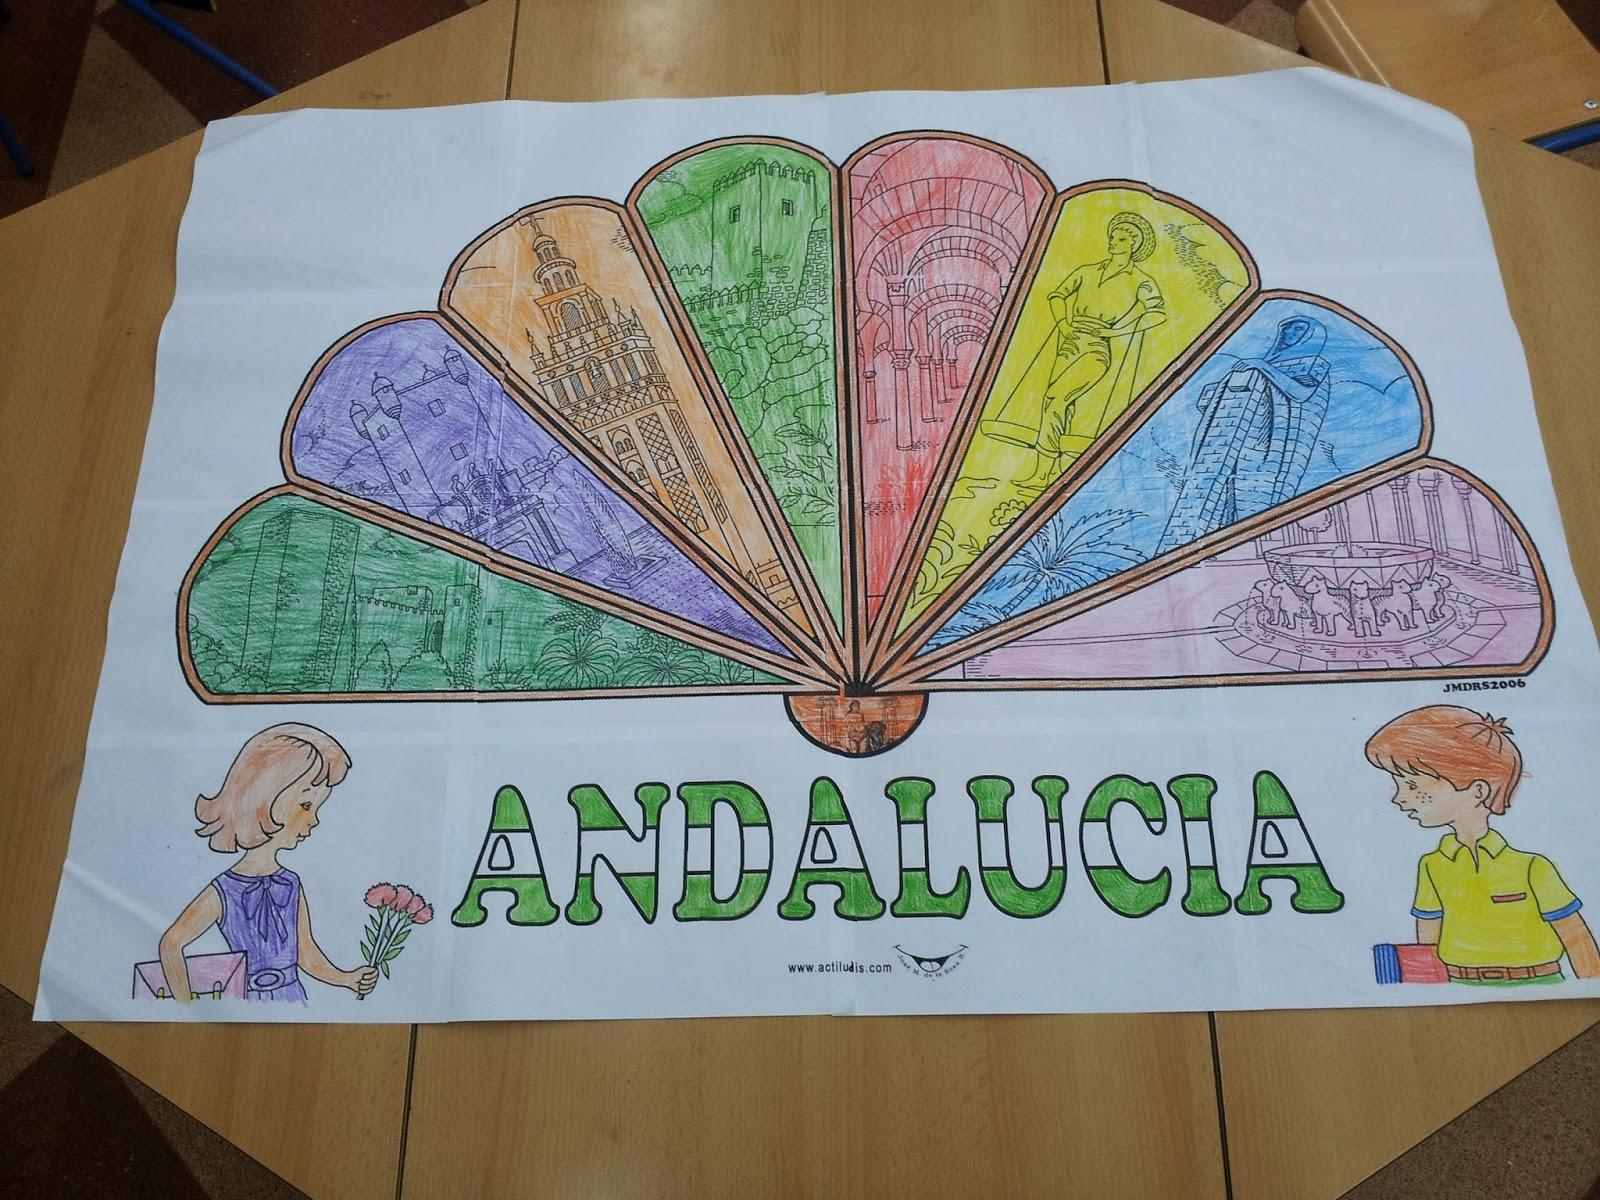 Trabajando en educaci n infantil monumentos de andaluc a - Feria de manualidades en barcelona ...